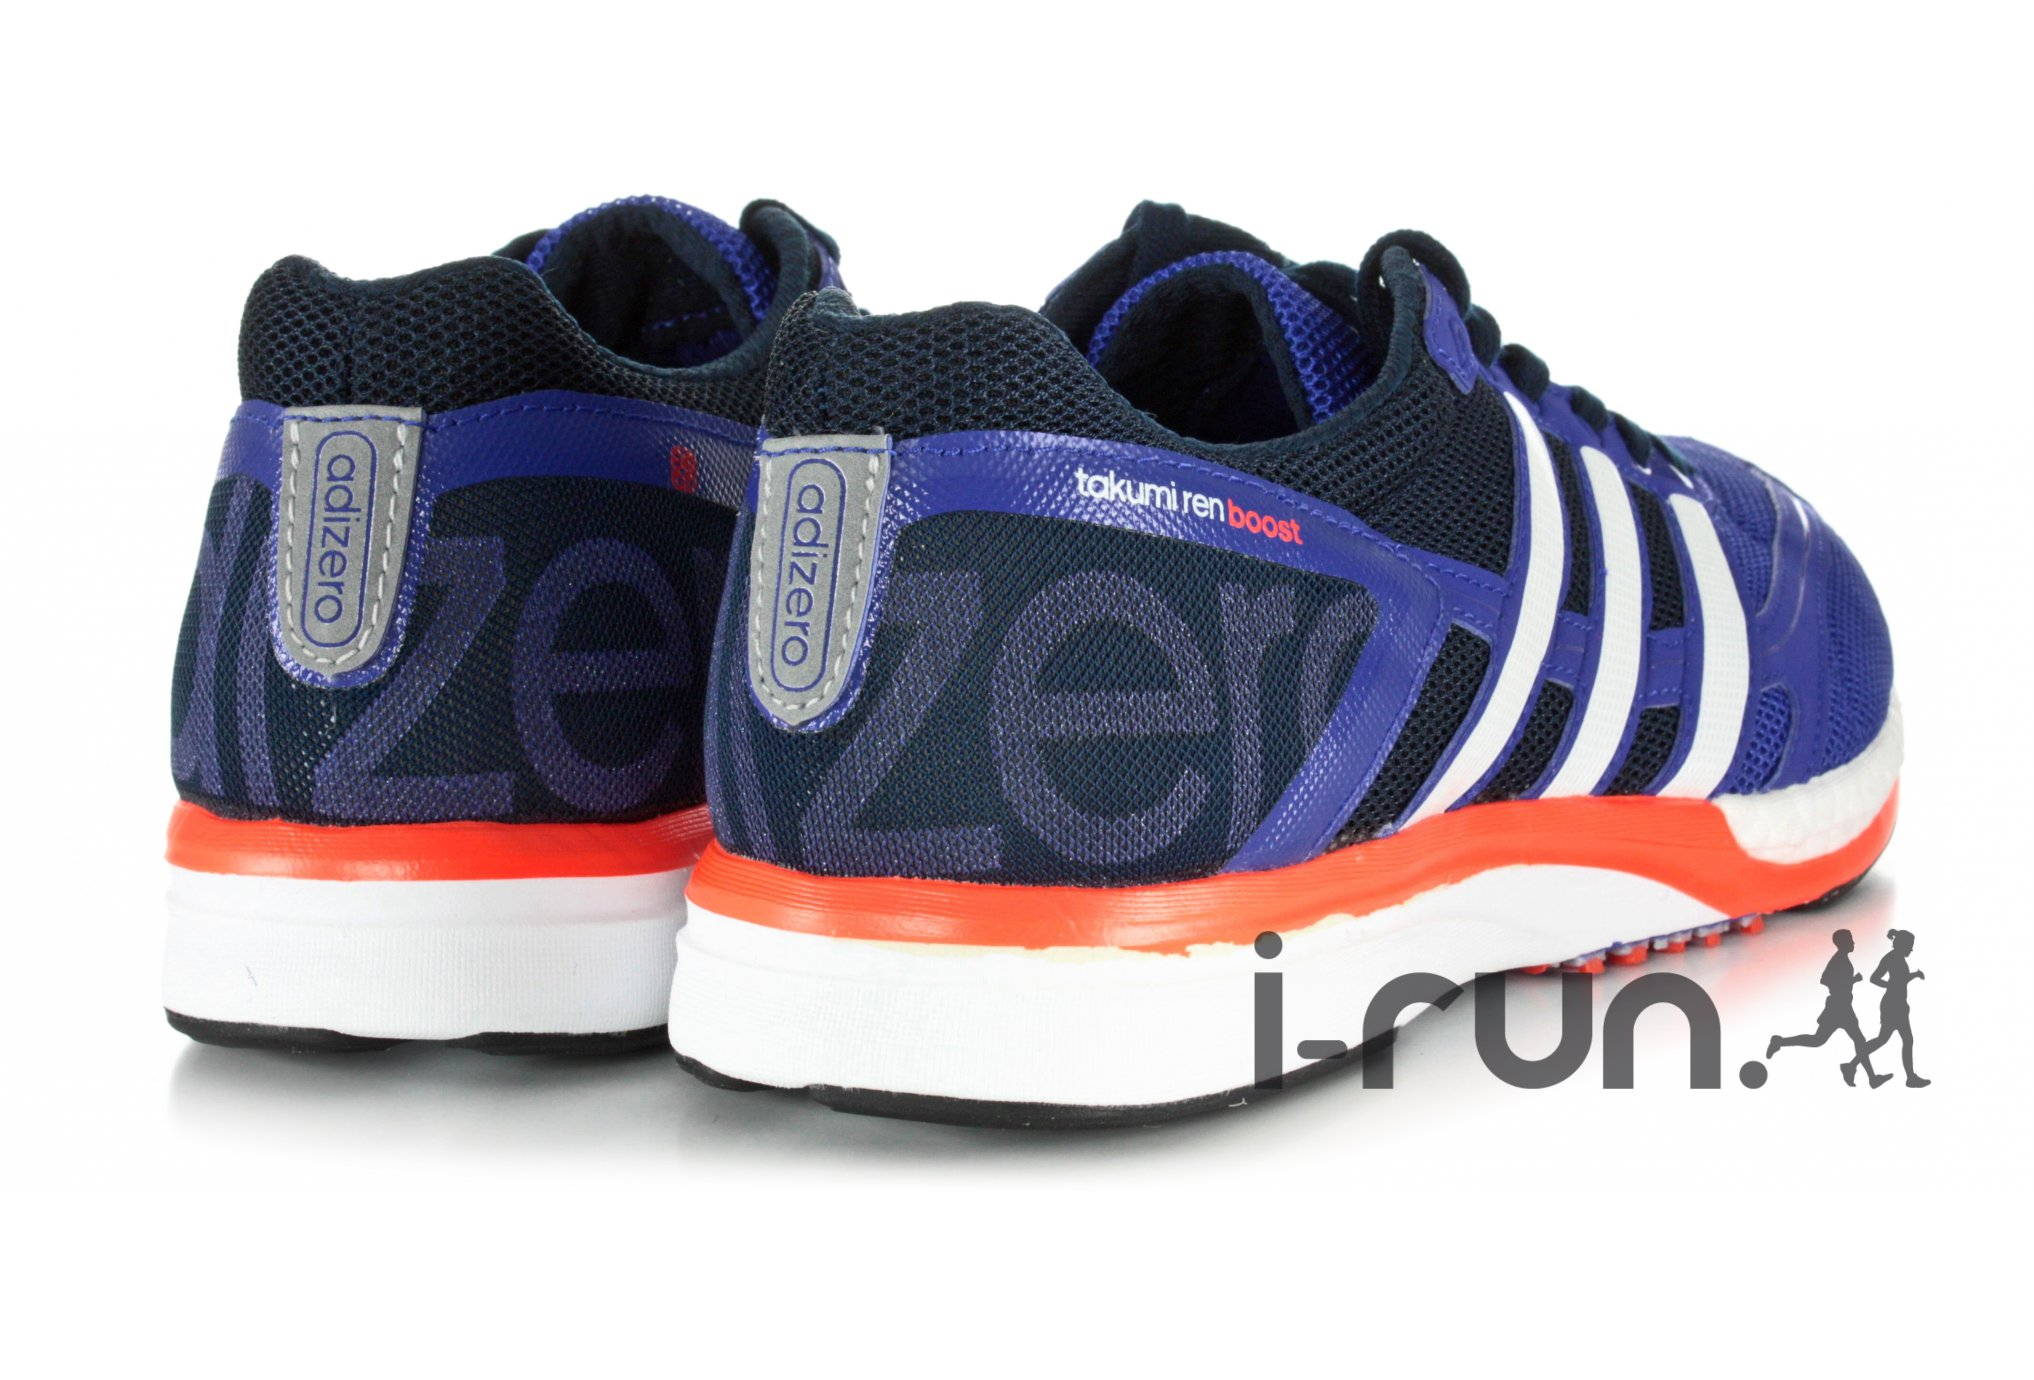 promo code 4953b a21d3 adidas-adizero-takumi-ren-boost-3